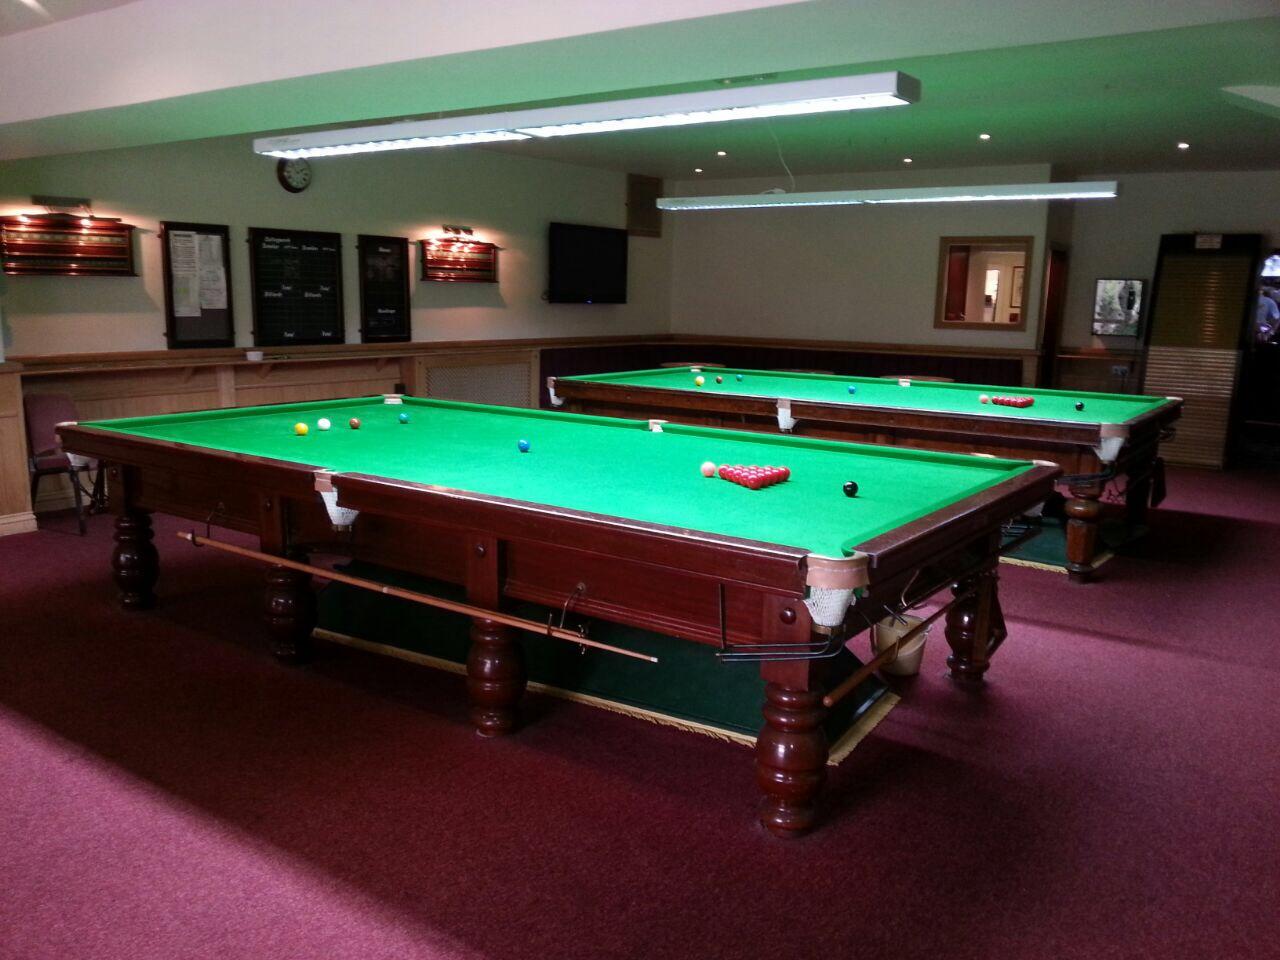 Cuesport Lighting Transforms Snooker Rooms Bsa Cuesports